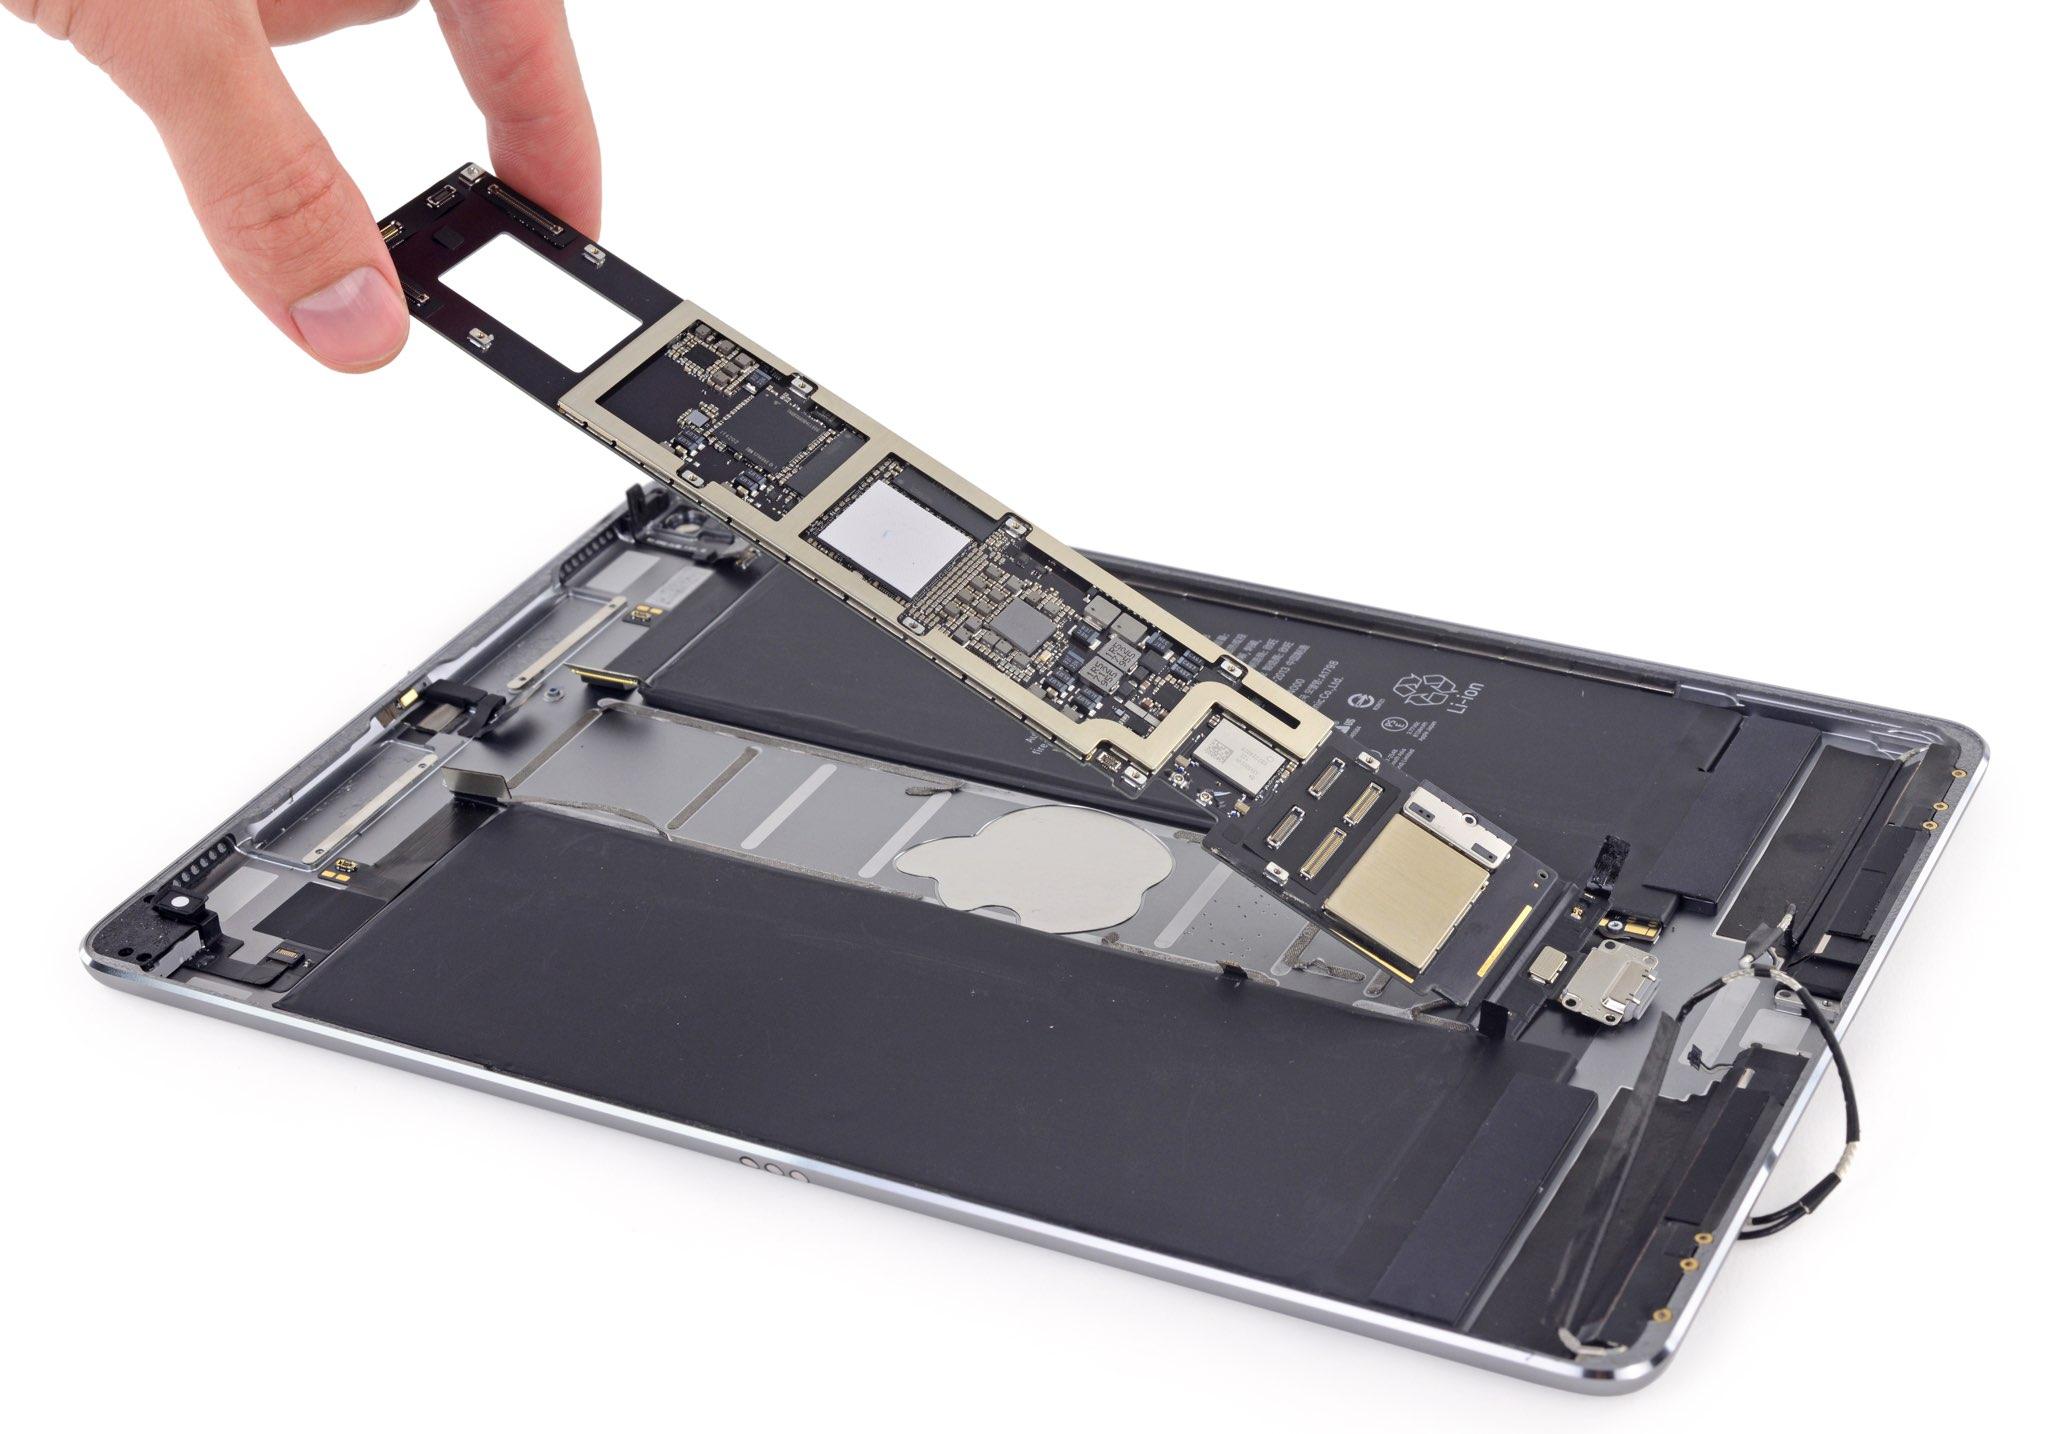 10.5-inch iPad Pro teardown image. 2018 iPad Pro models are said to run Apple's enhanced A12X Bionic chip.